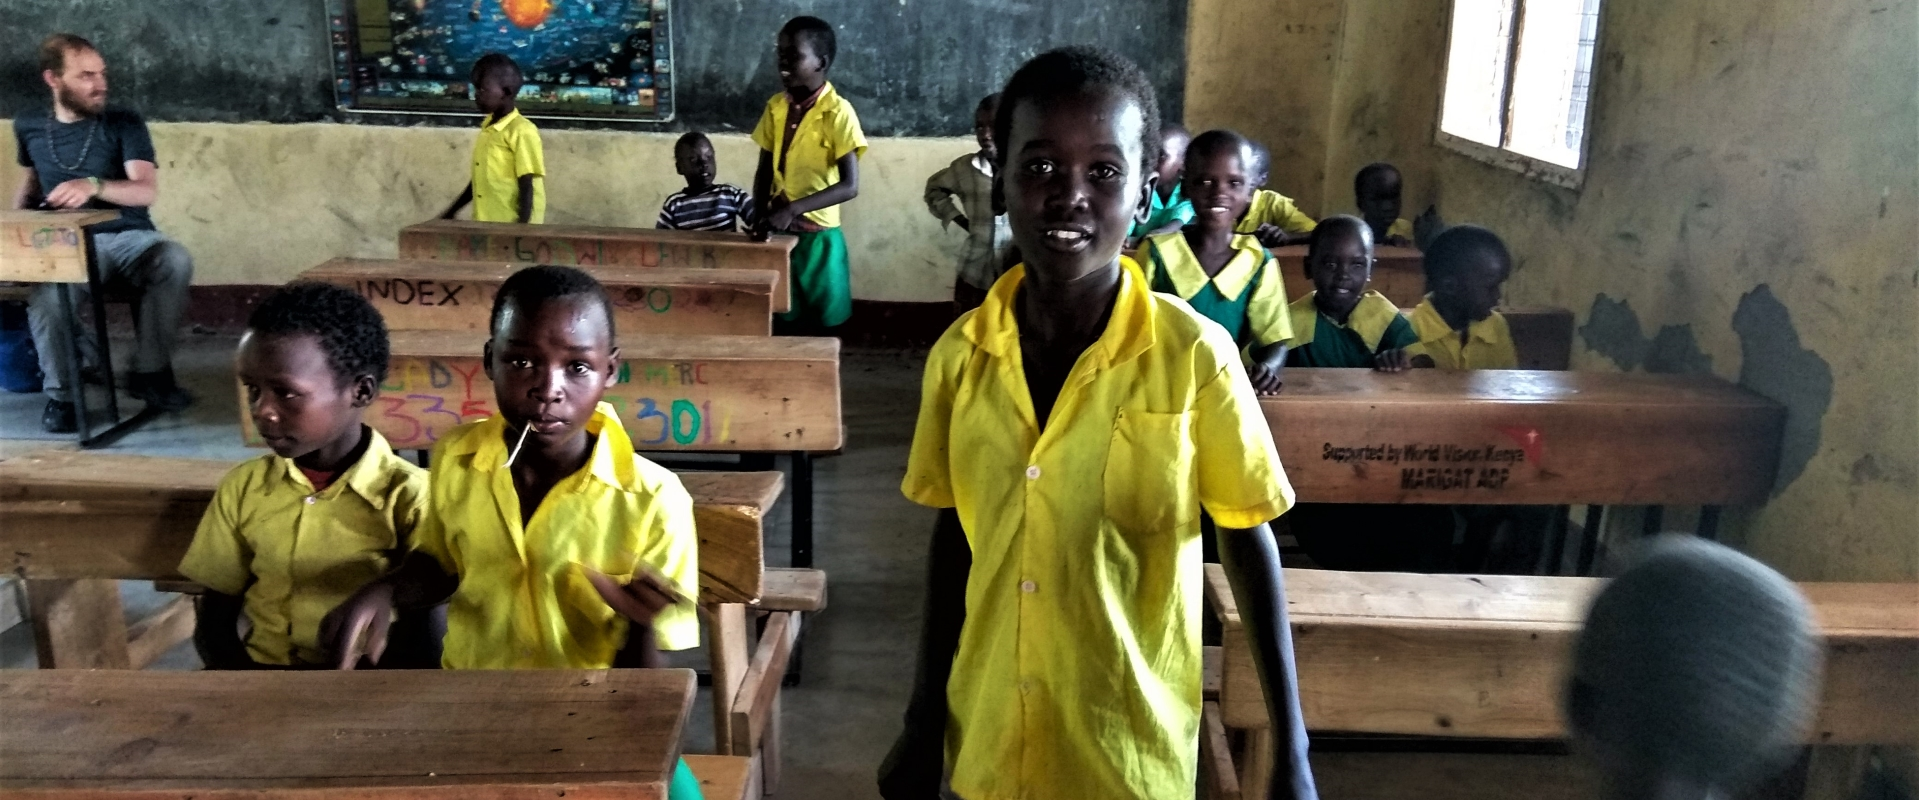 scuola bambini Kenya Mani Tese 2017